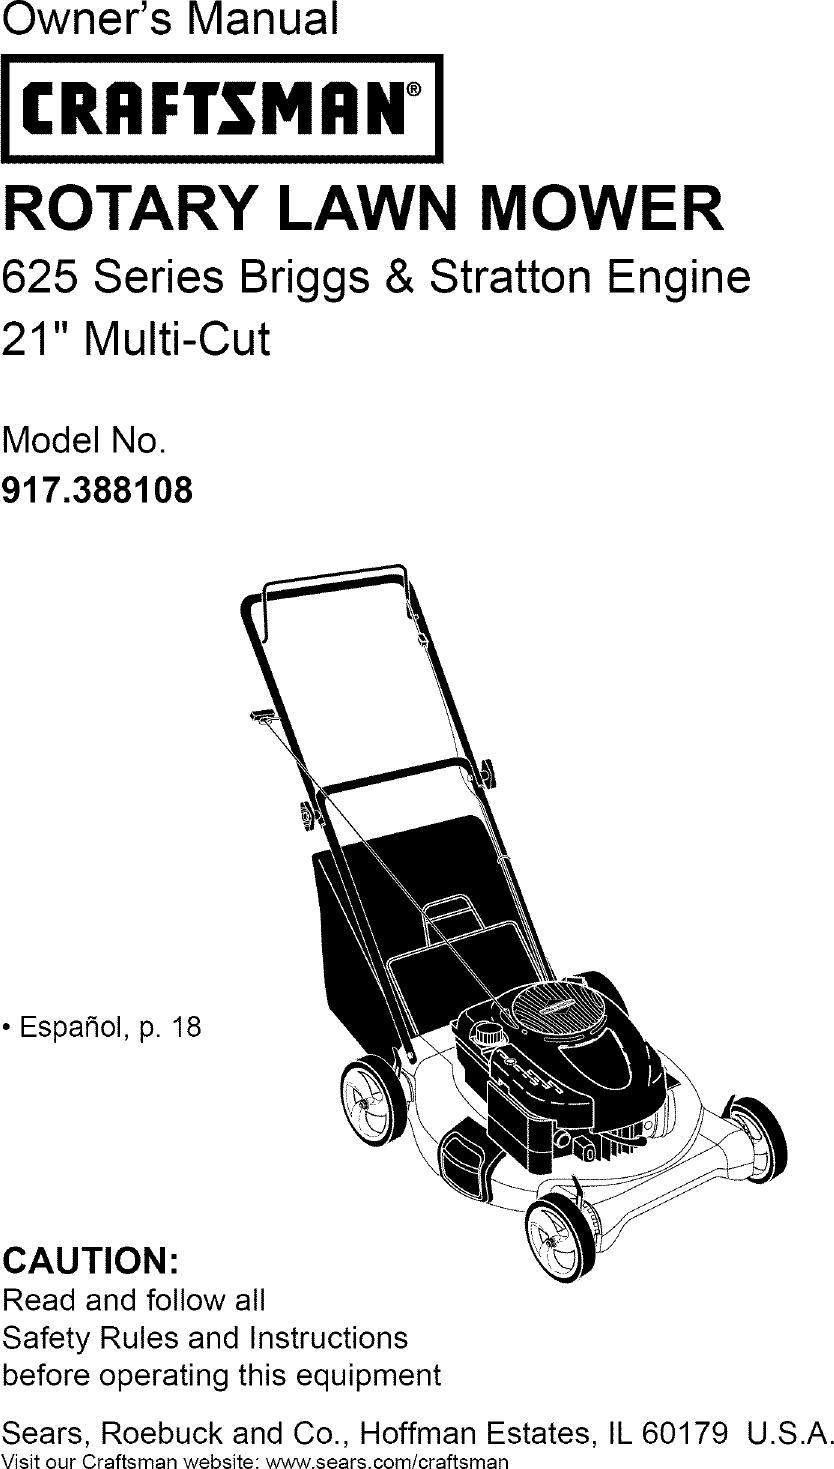 Craftsman 917388108 User Manual LAWN MOWER Manuals And